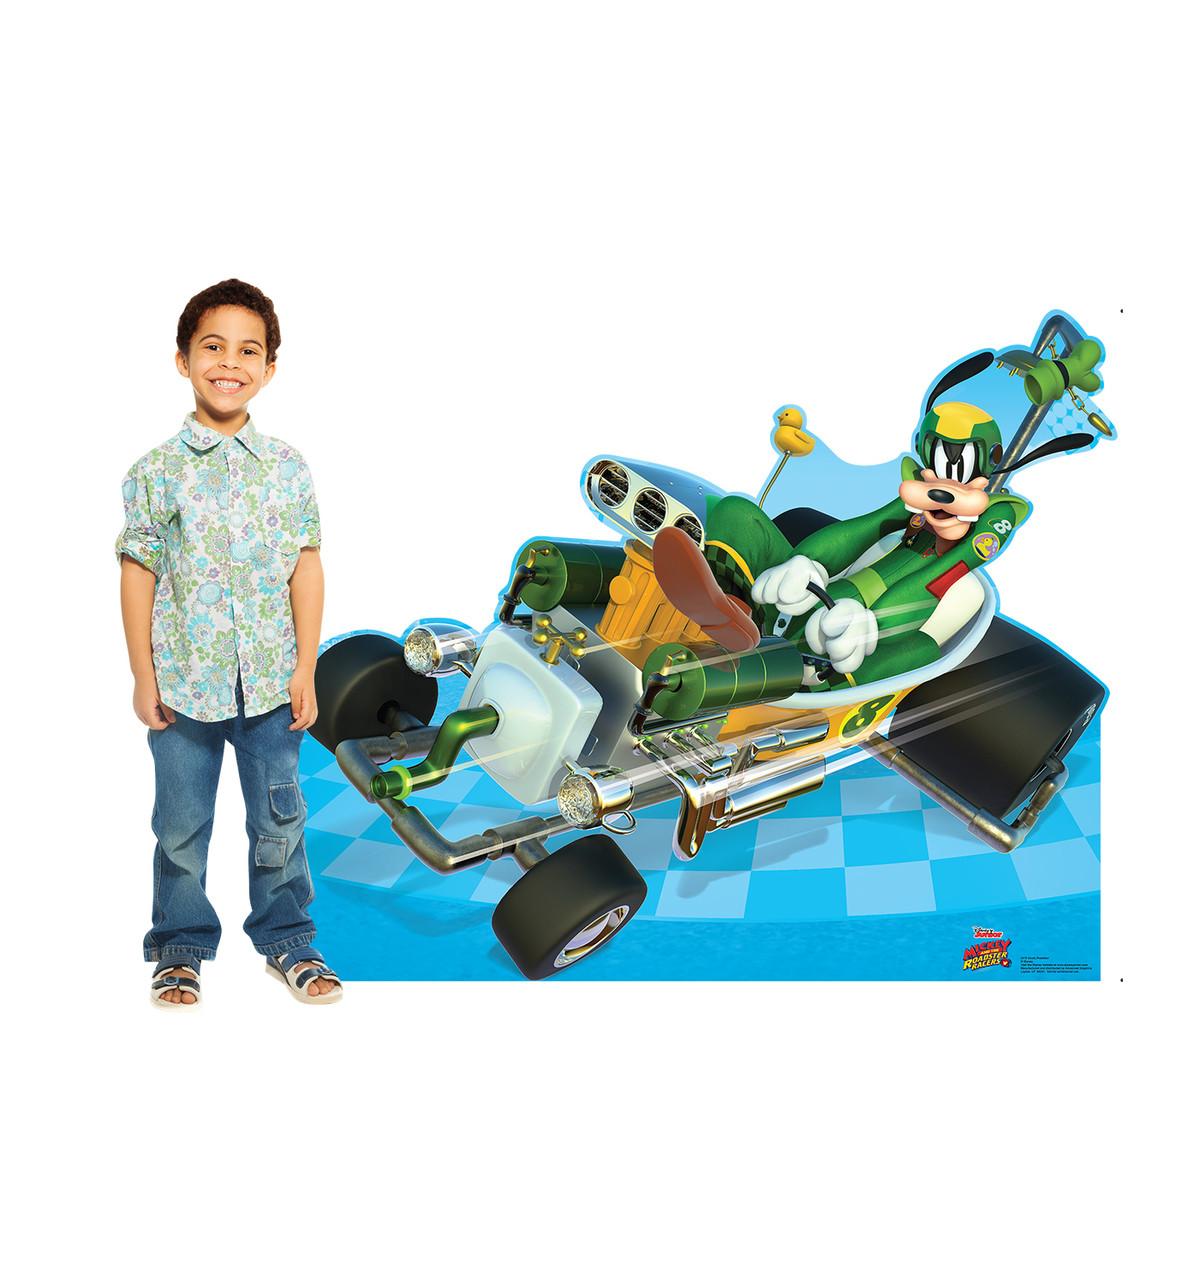 Life-size Goofy Roadster (Disney's Roadster Racers) Cardboard Standup | Cardboard Cutout